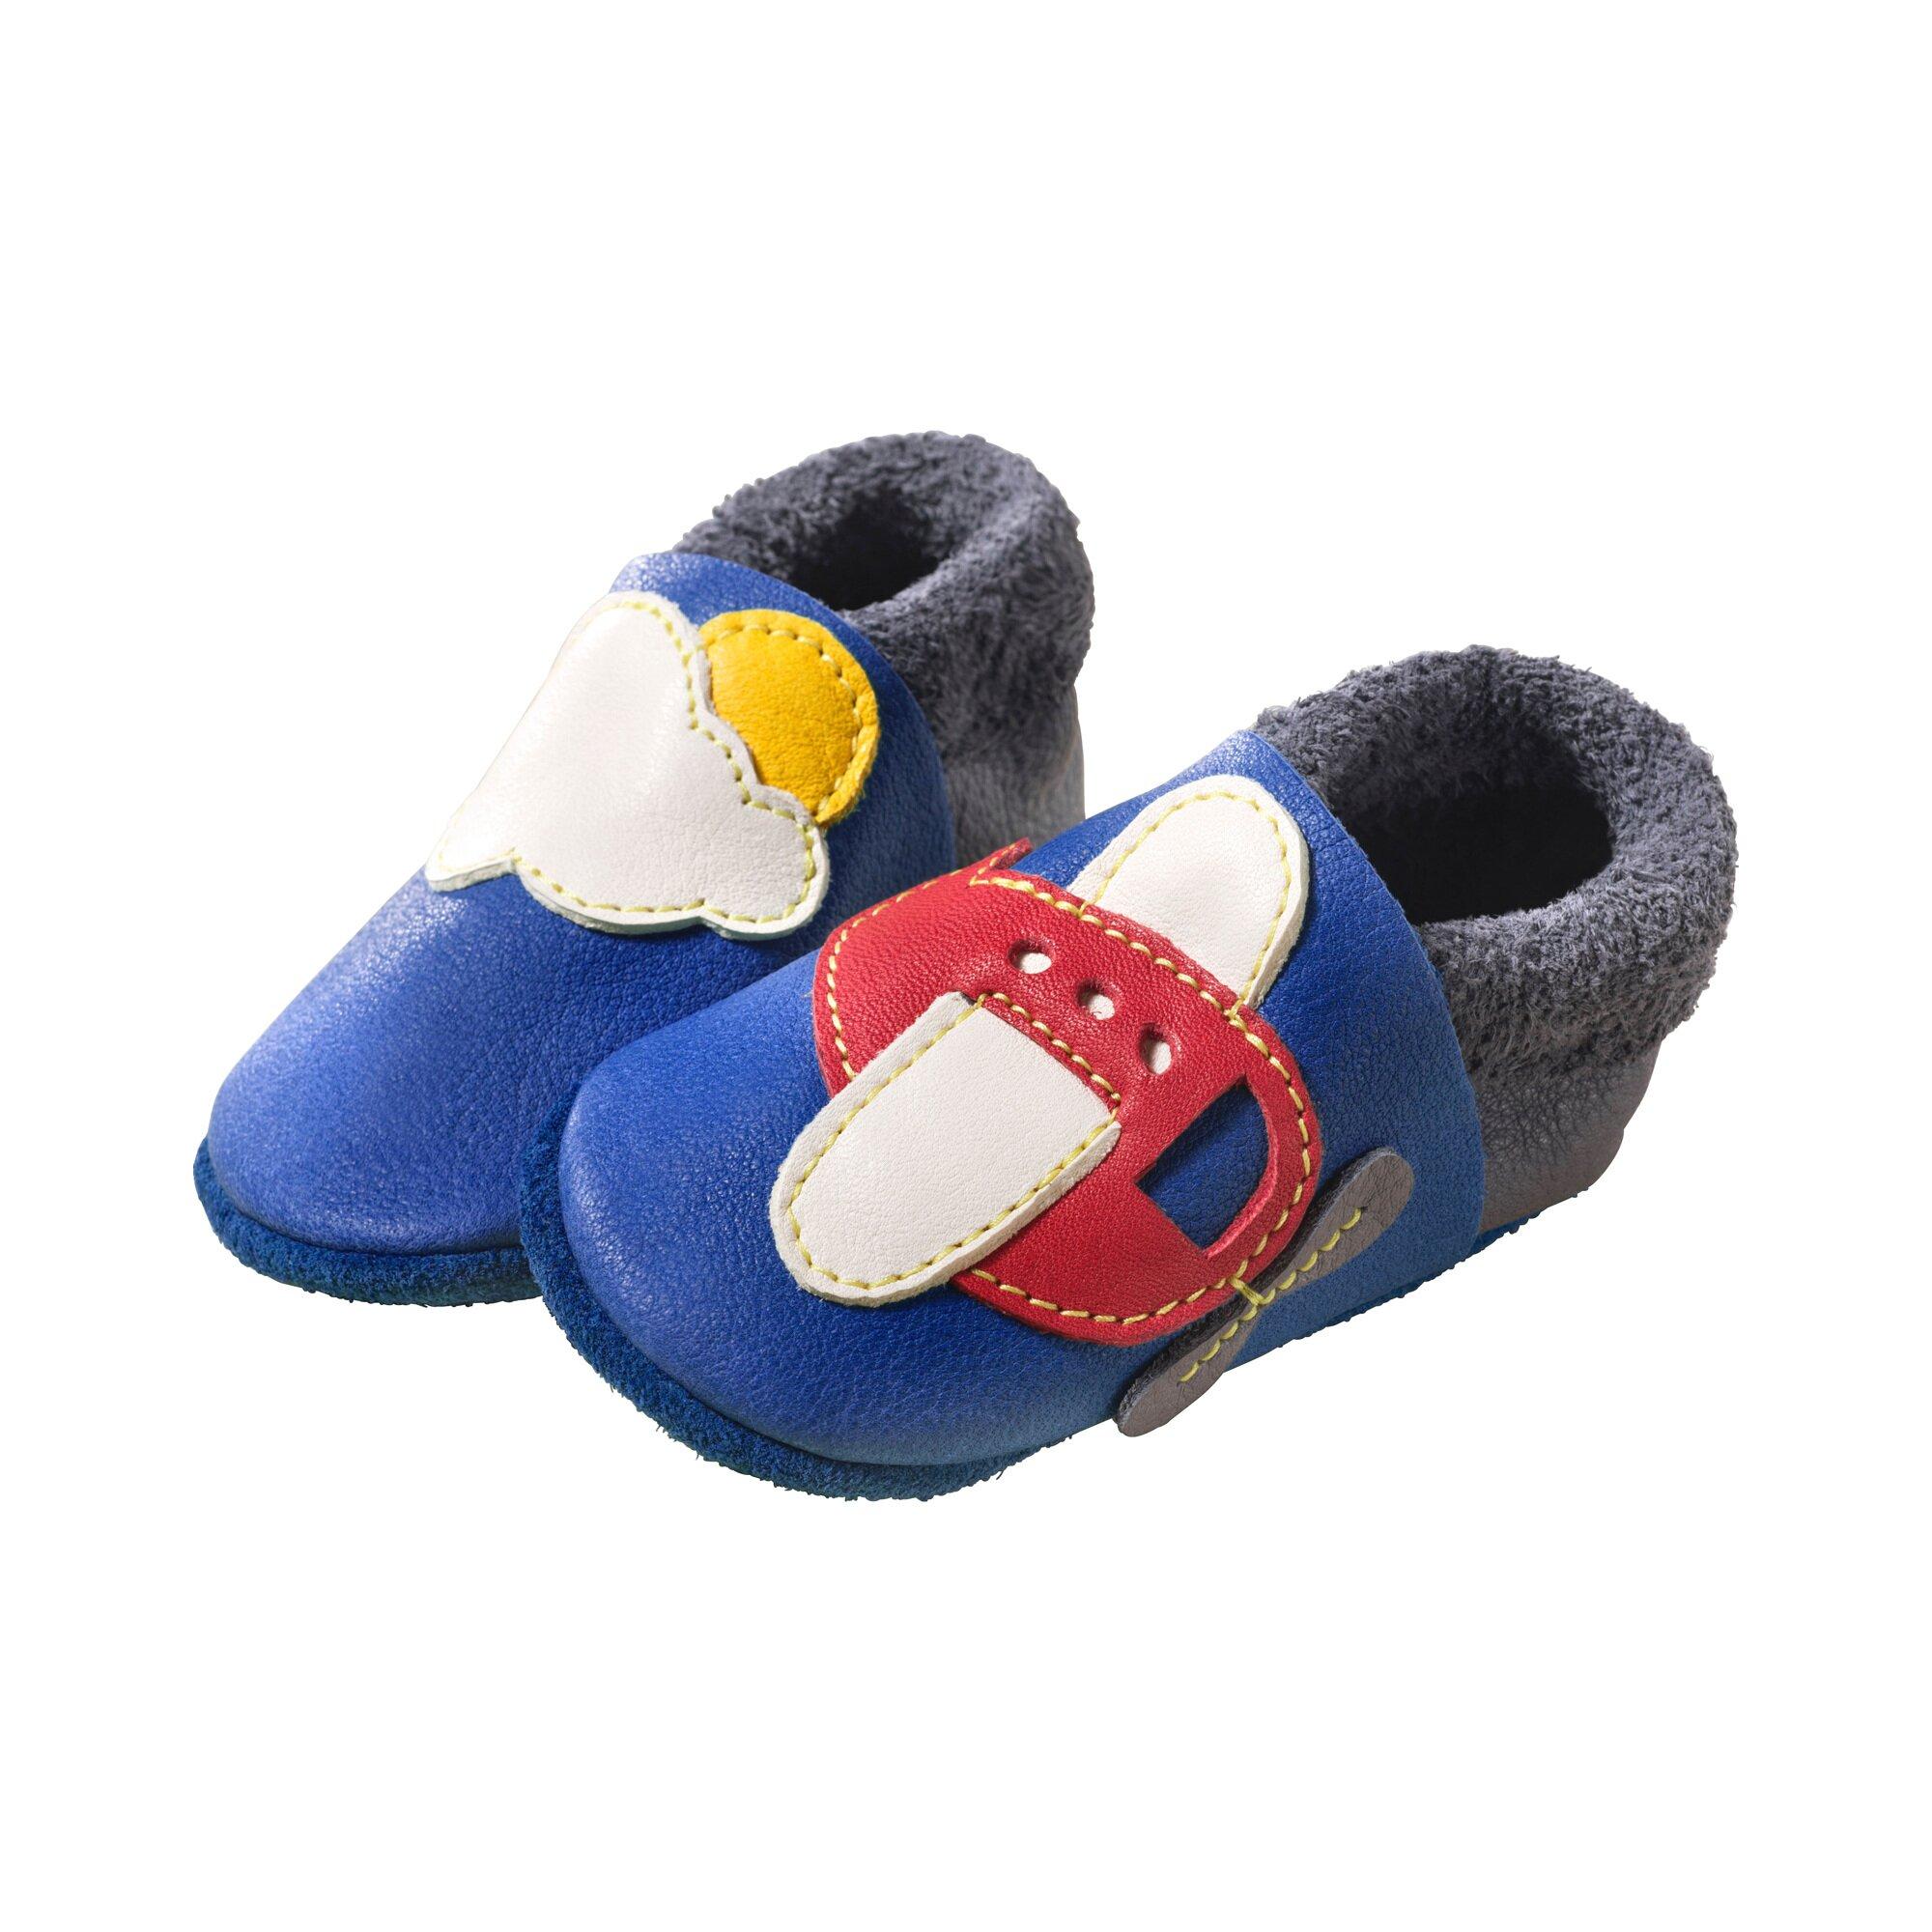 pololo-krabbel-hausschuhe-flieger-blau-18-20-22-24